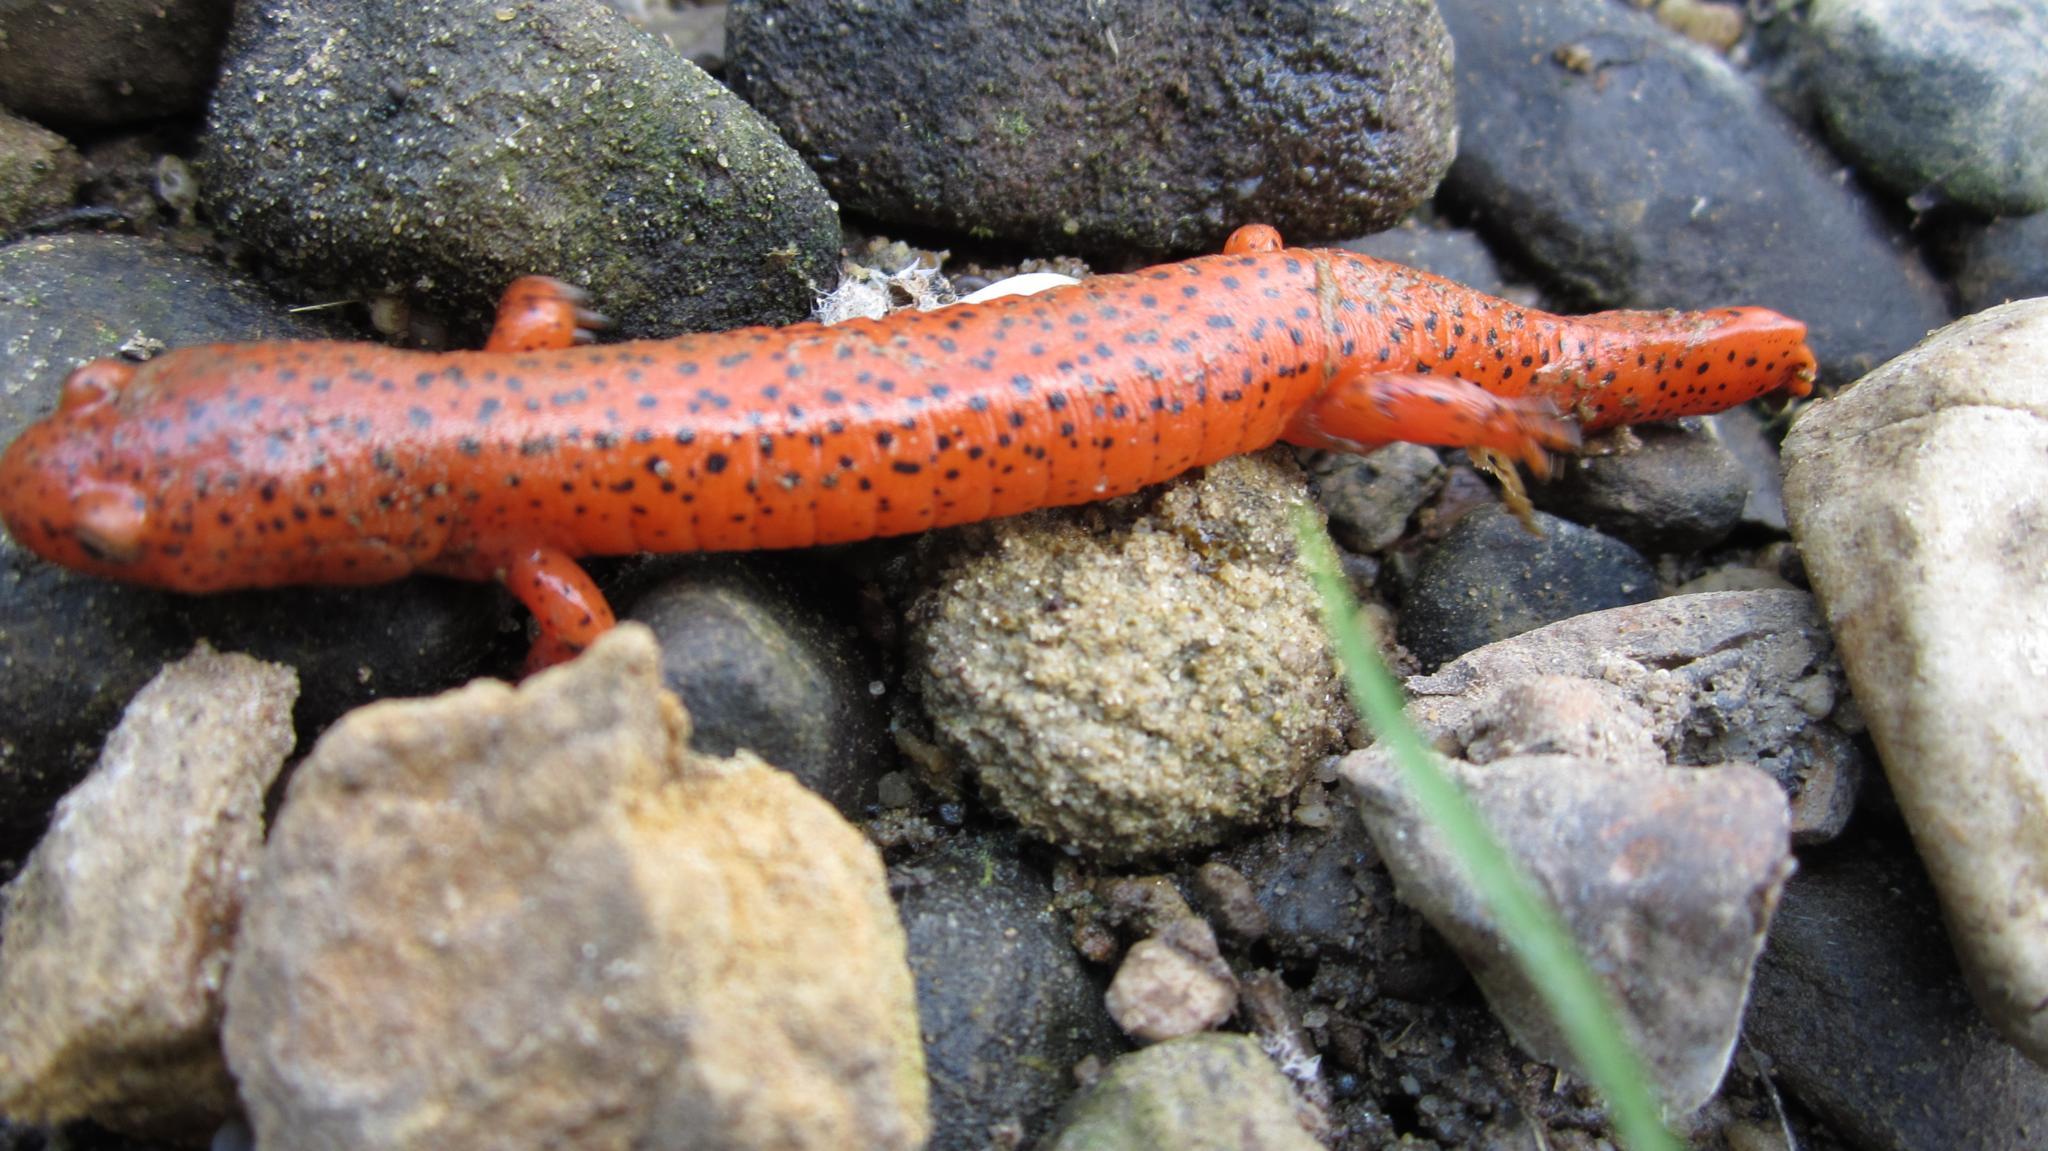 northern red salamander by conniemacerol